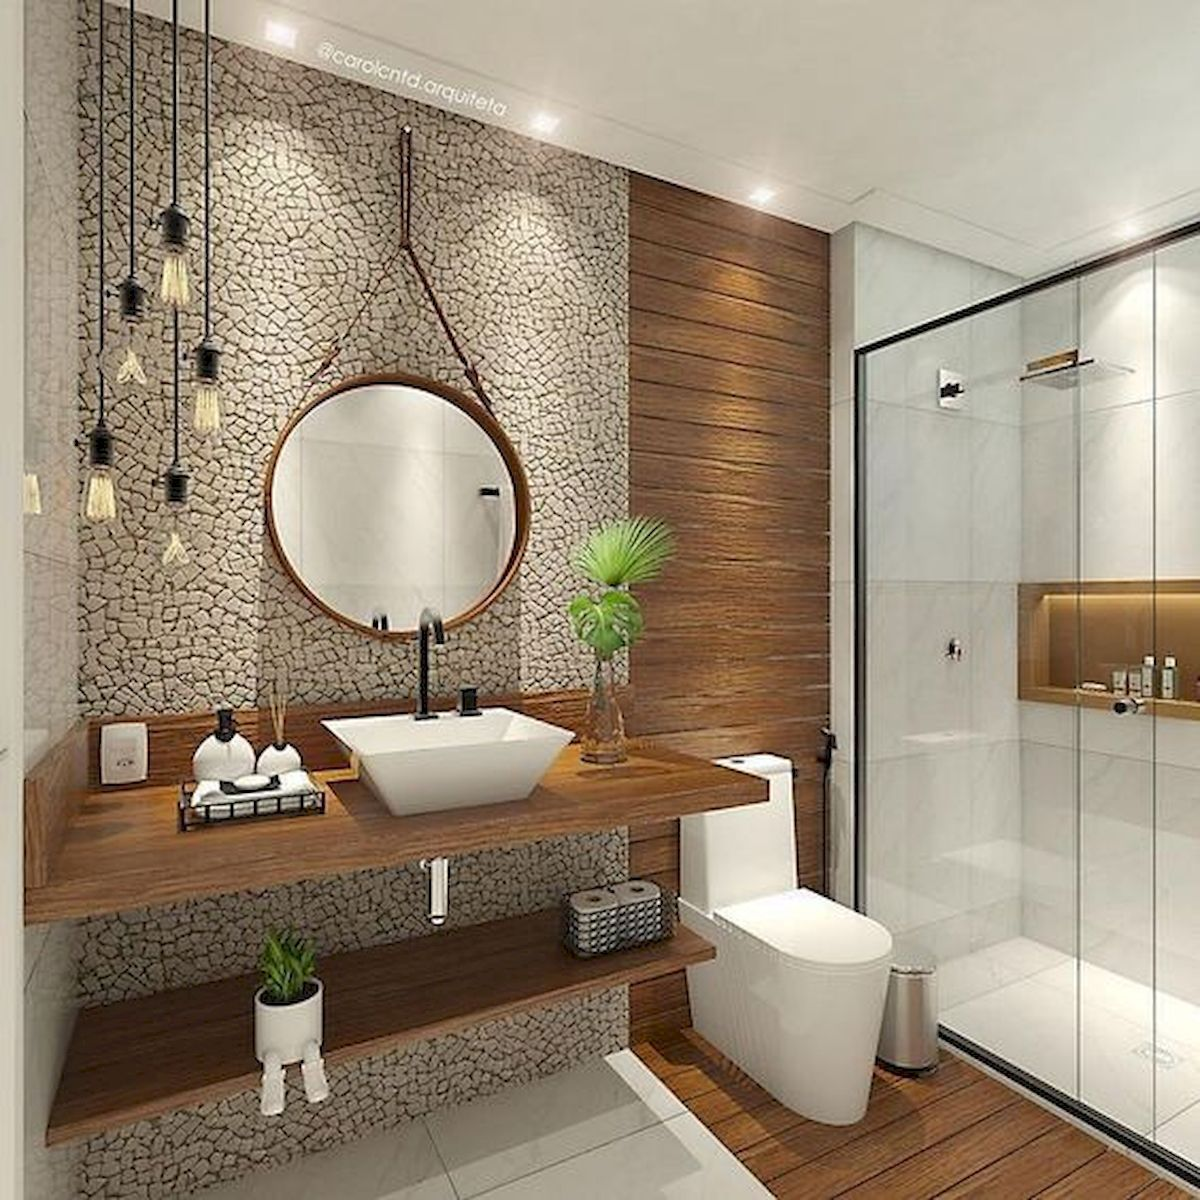 60 Elegant Small Master Bathroom Remodel Ideas (15) in ...